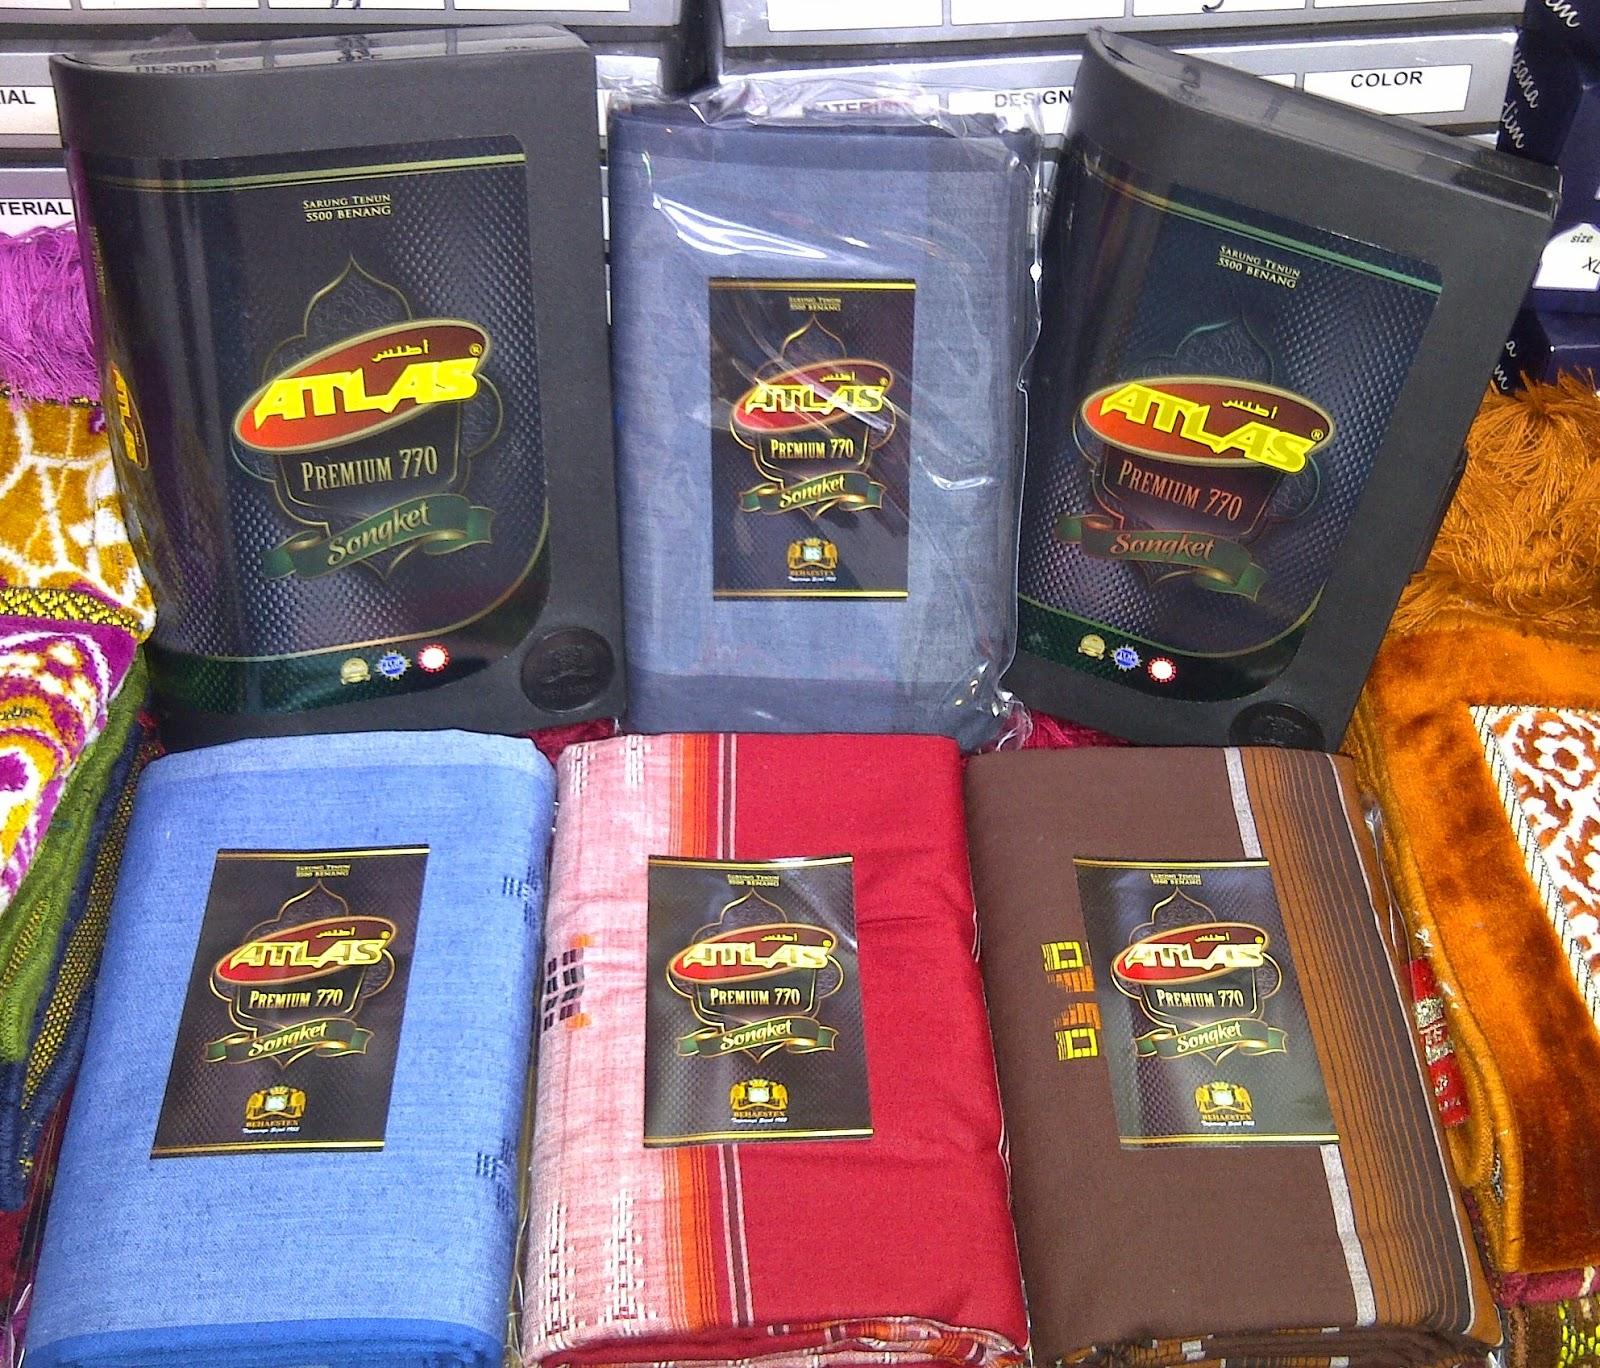 GROSIR Atlas Premium Songket Spesial 770 Sarung Murah